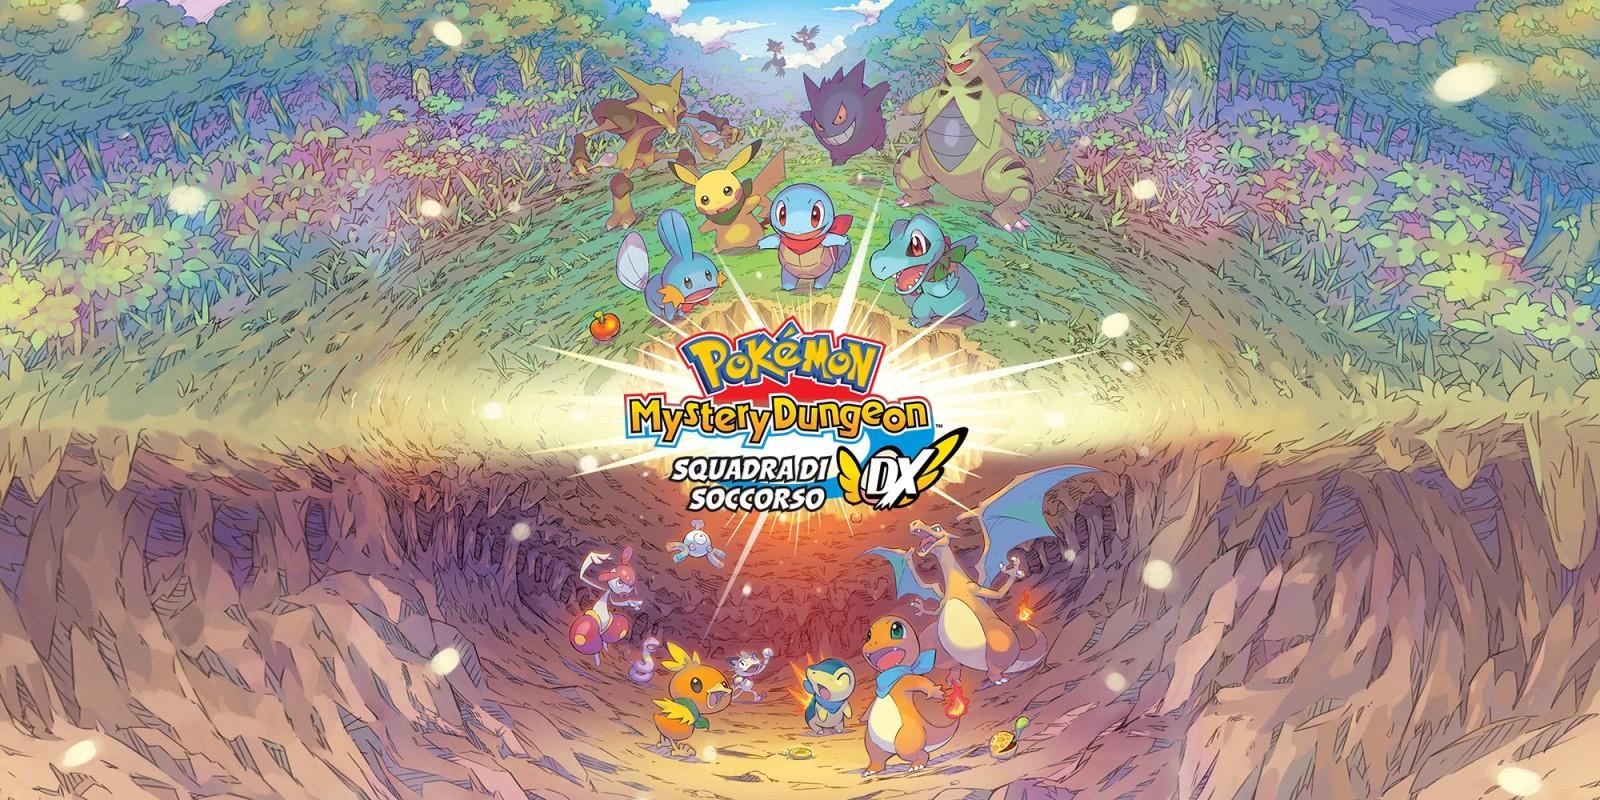 Pokémon Mystery Dungeon Rescue Team DX recensione: così uguale e così diverso. thumbnail